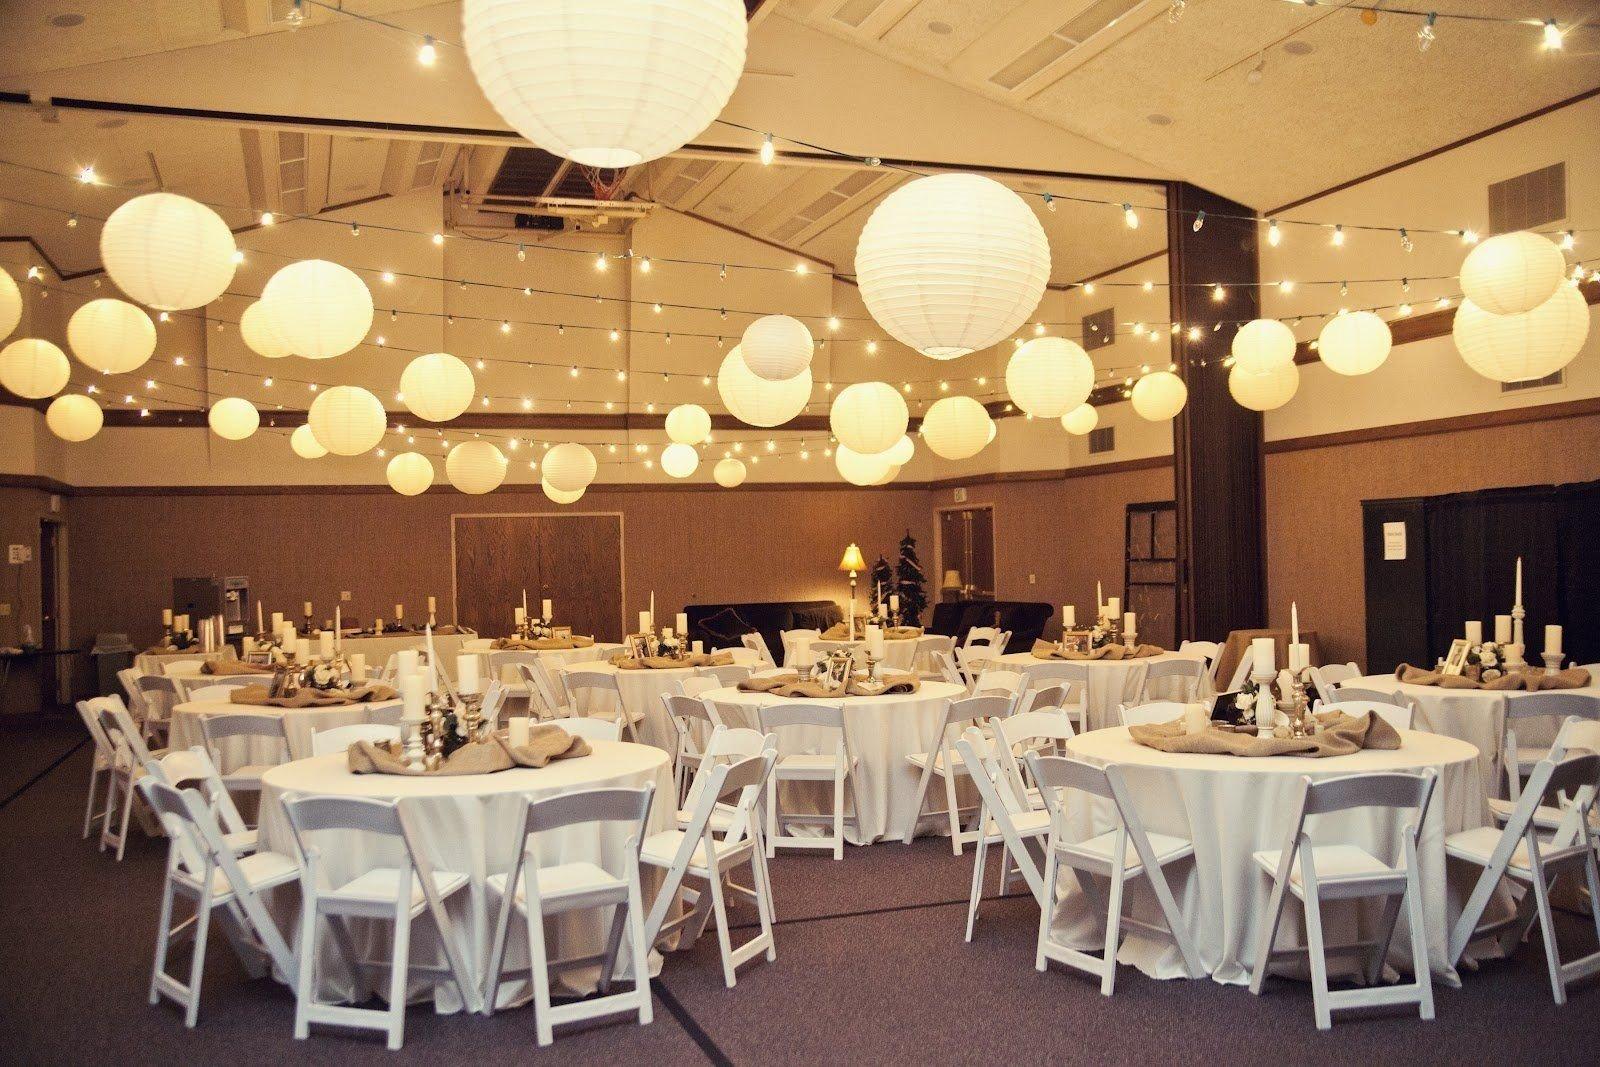 risultati immagini per low budget wedding decorations | wedding